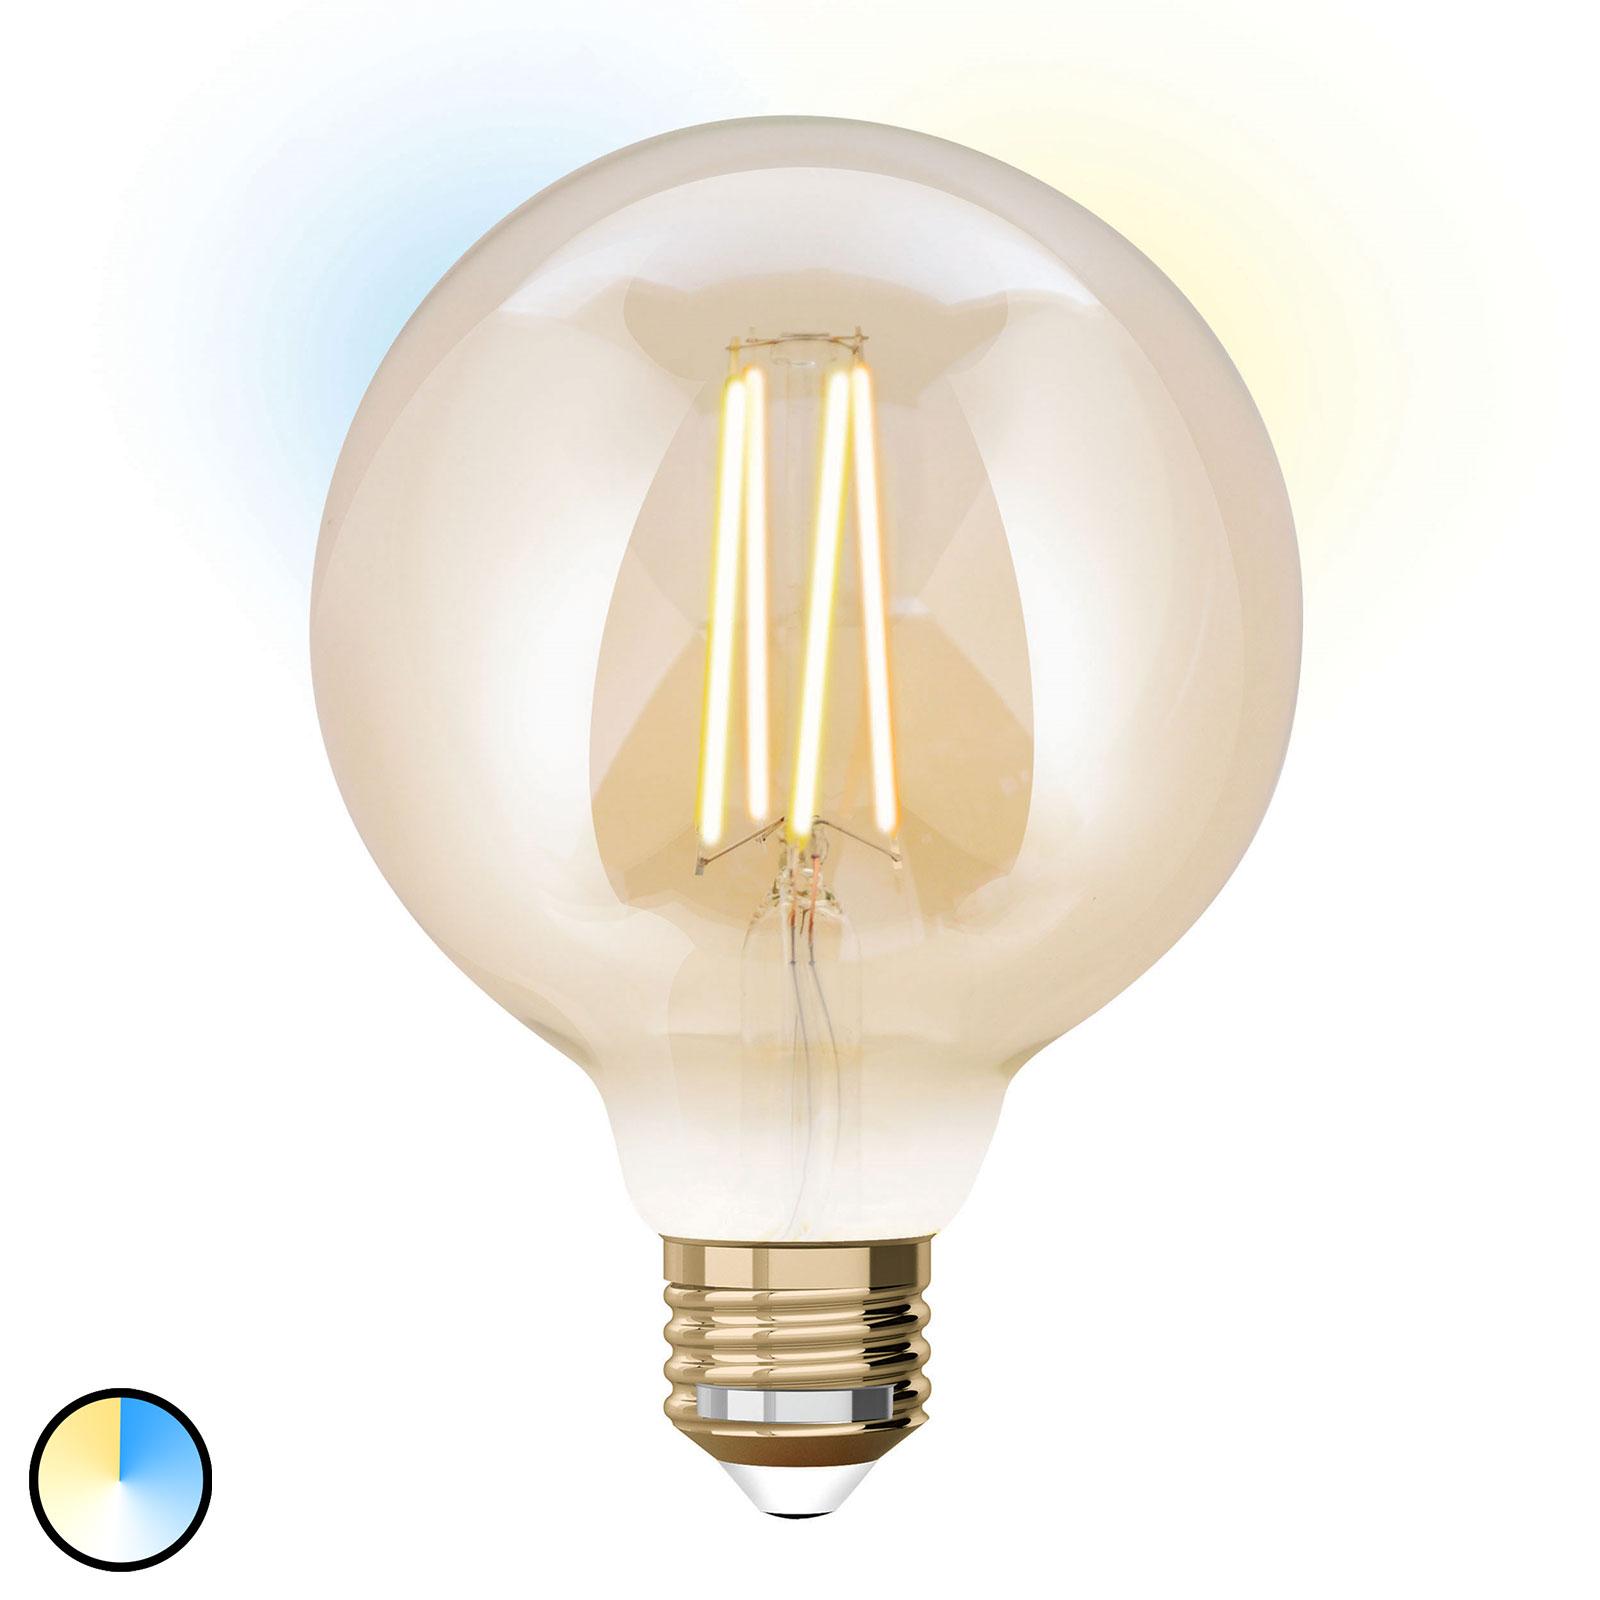 iDual LED-Globelampe E27 9W Erweiterung 9,5 cm